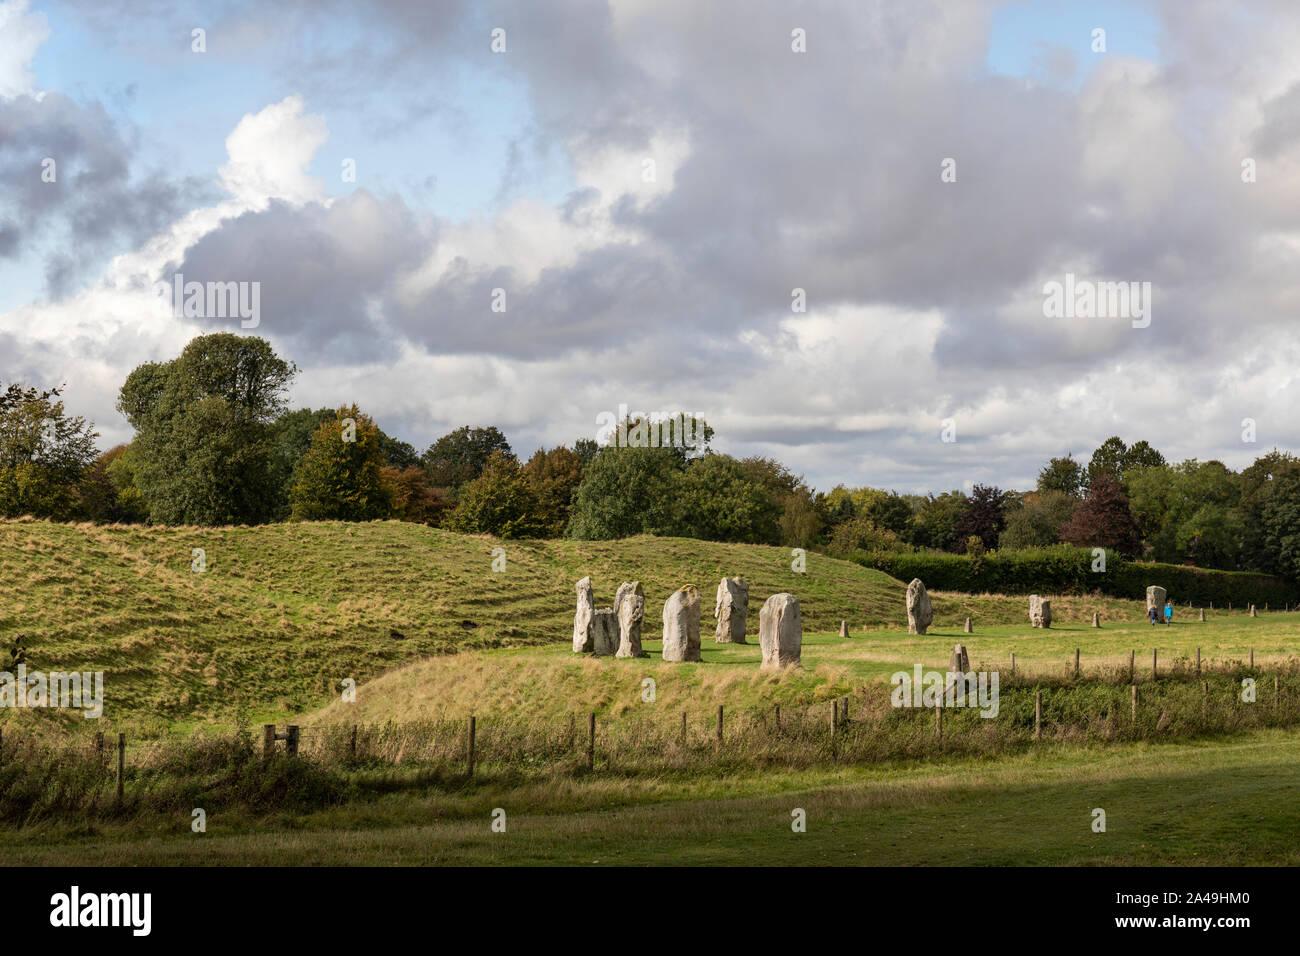 Standing stones at Avebury, Wiltshire a UNESCO World Heritage Site Stock Photo